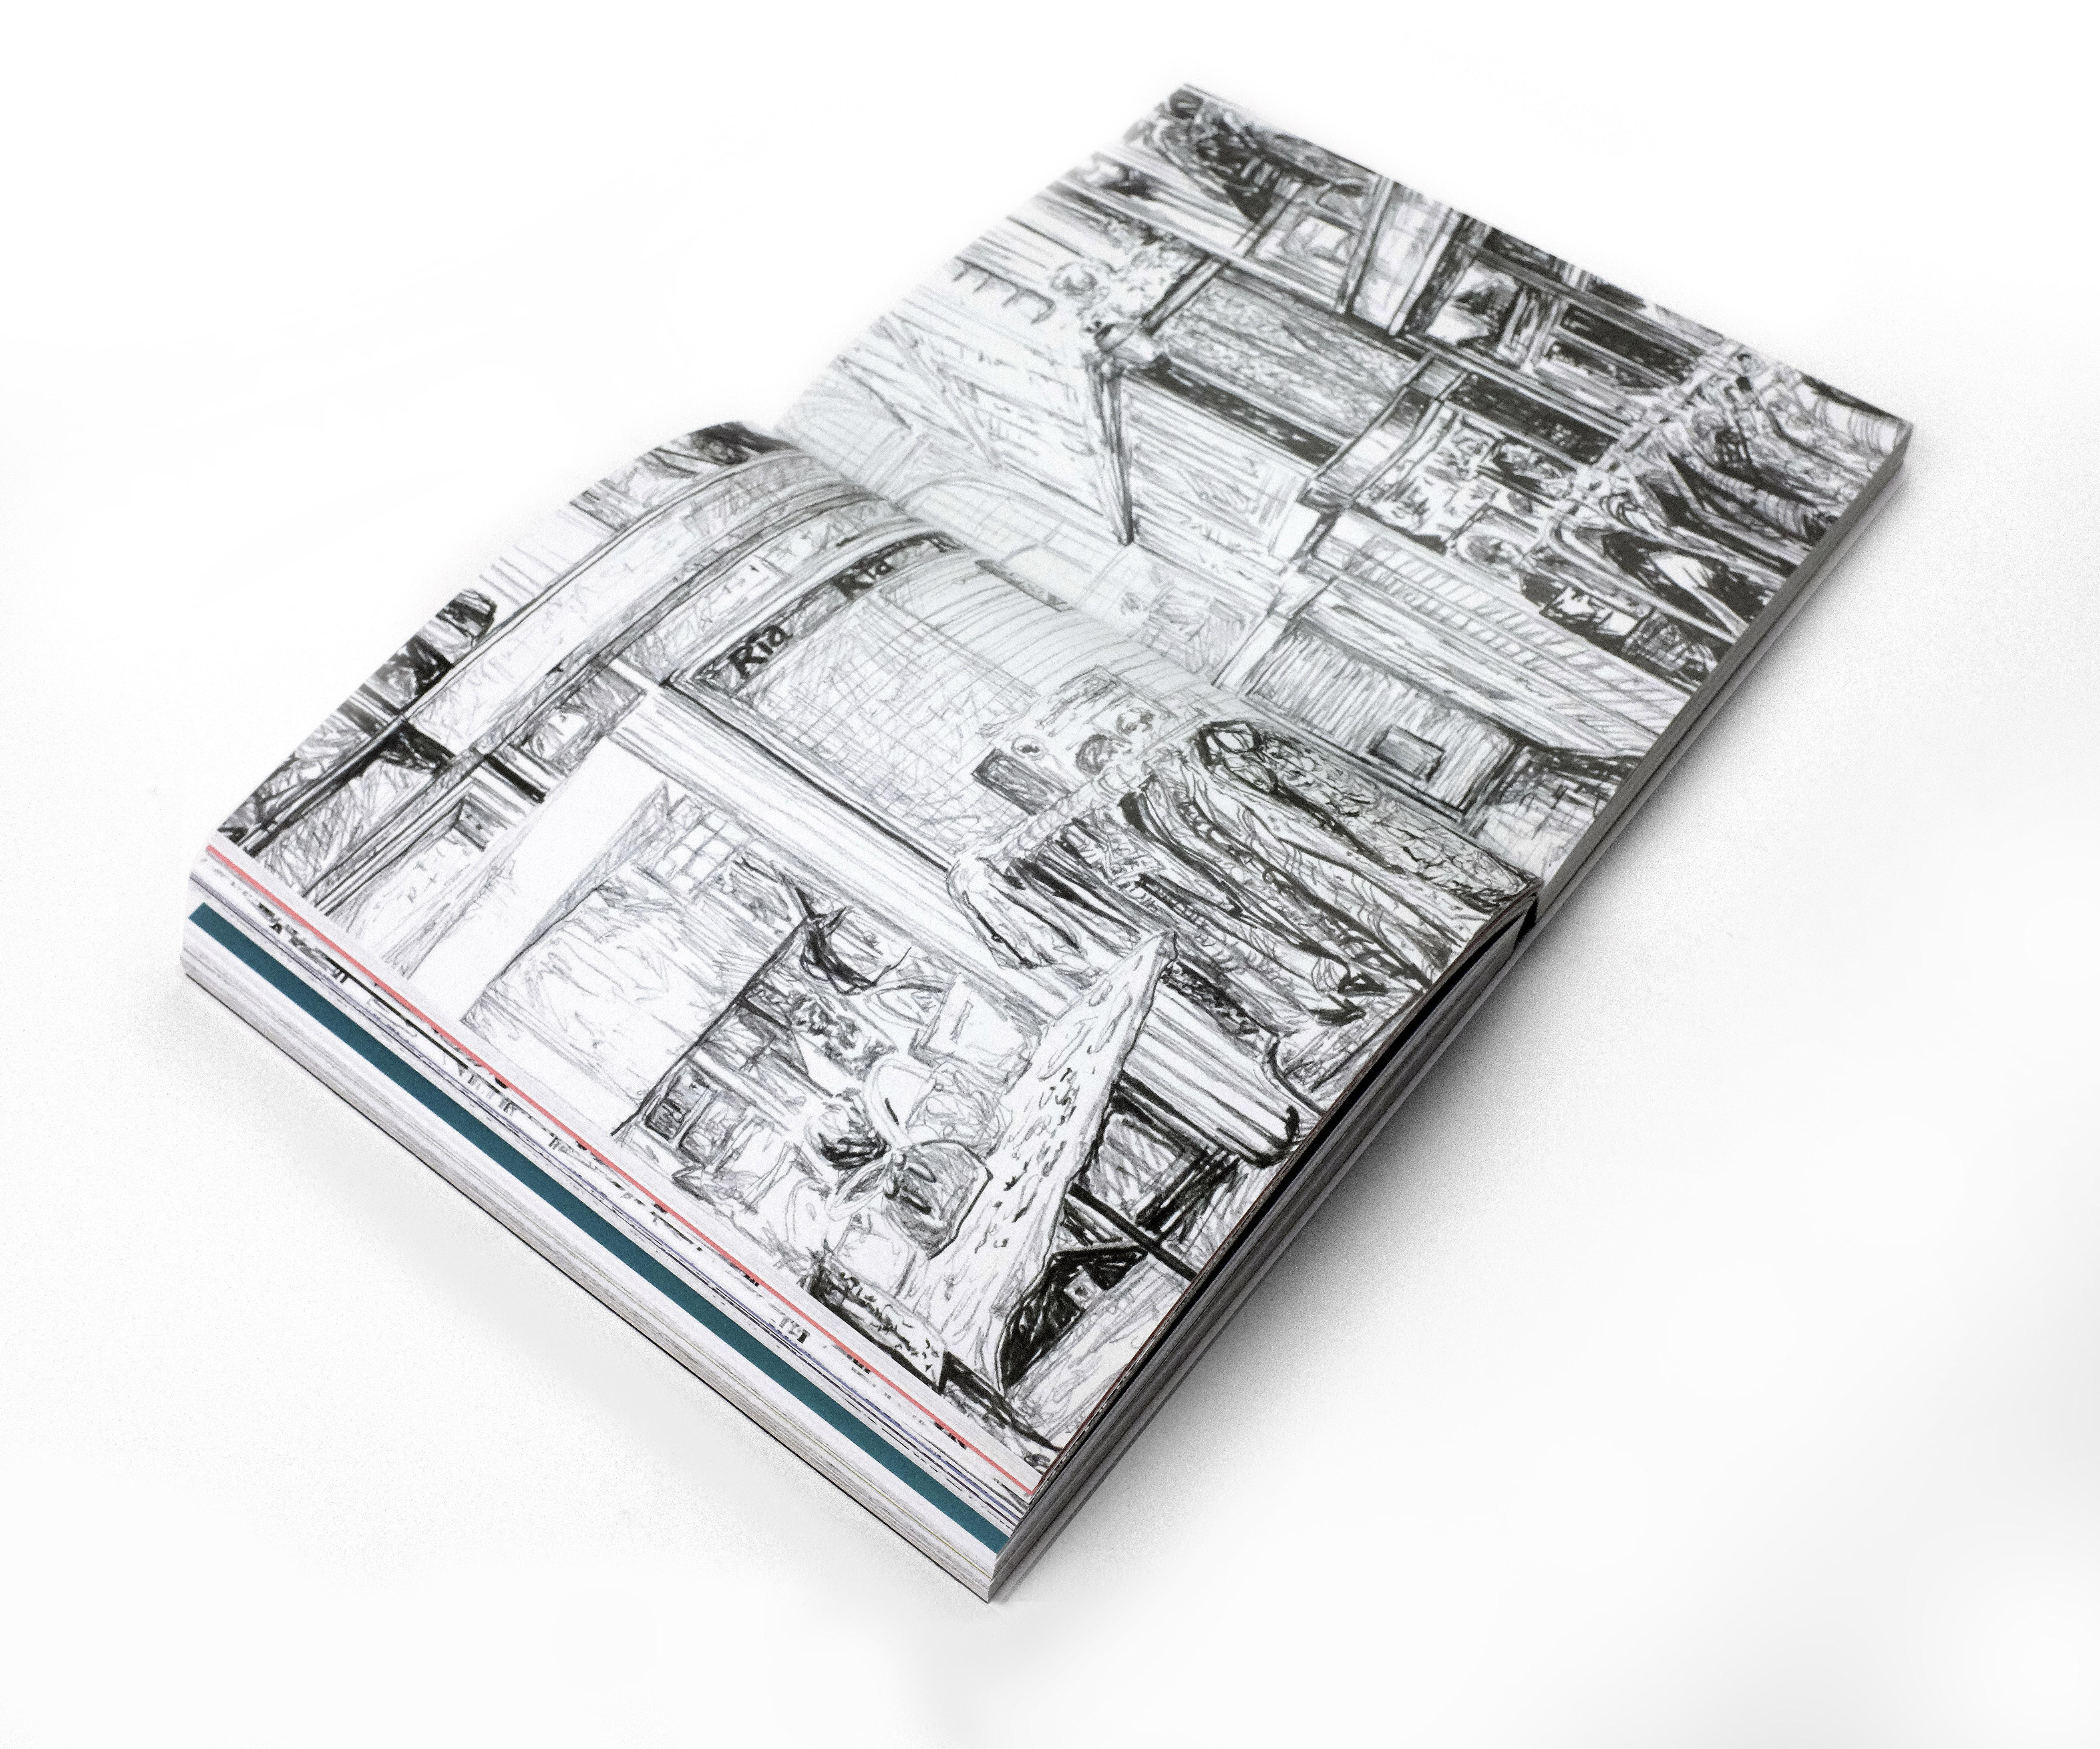 foto boek open pagina 2